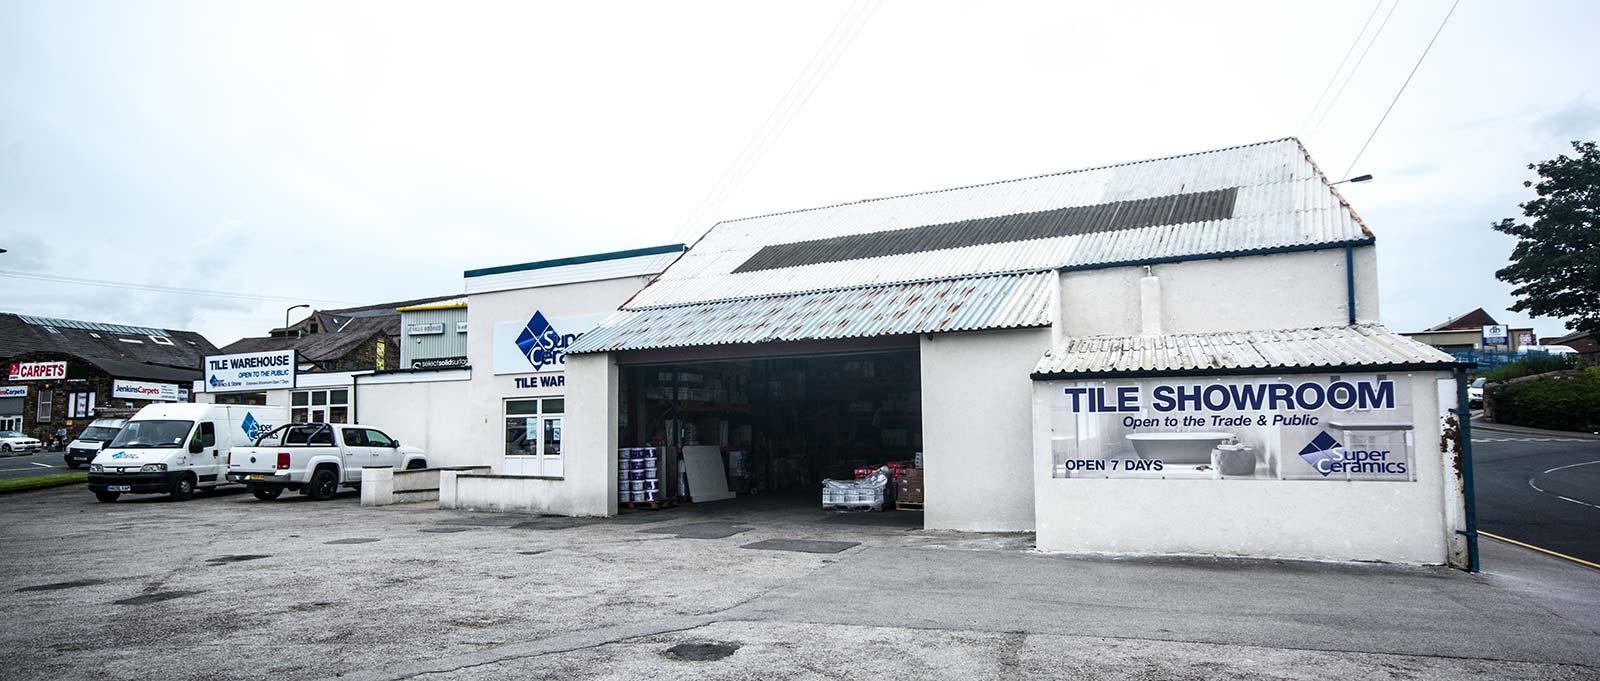 Superceramics Tile Shop Keighley